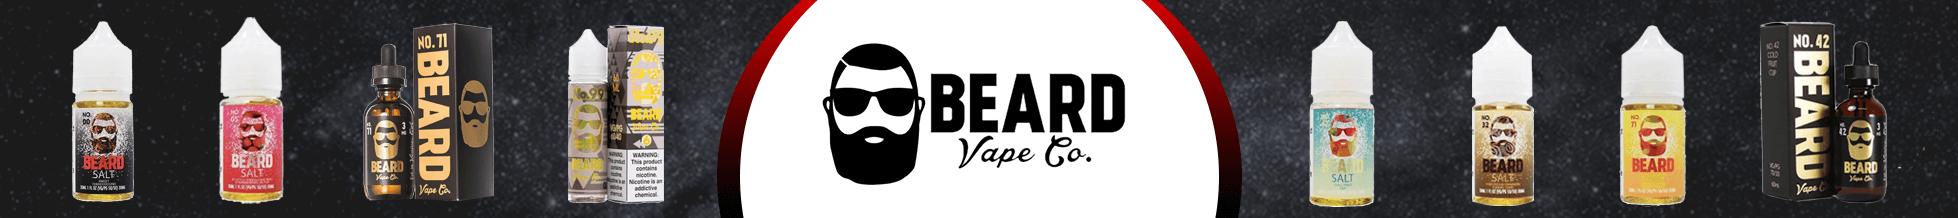 beard-vape.png